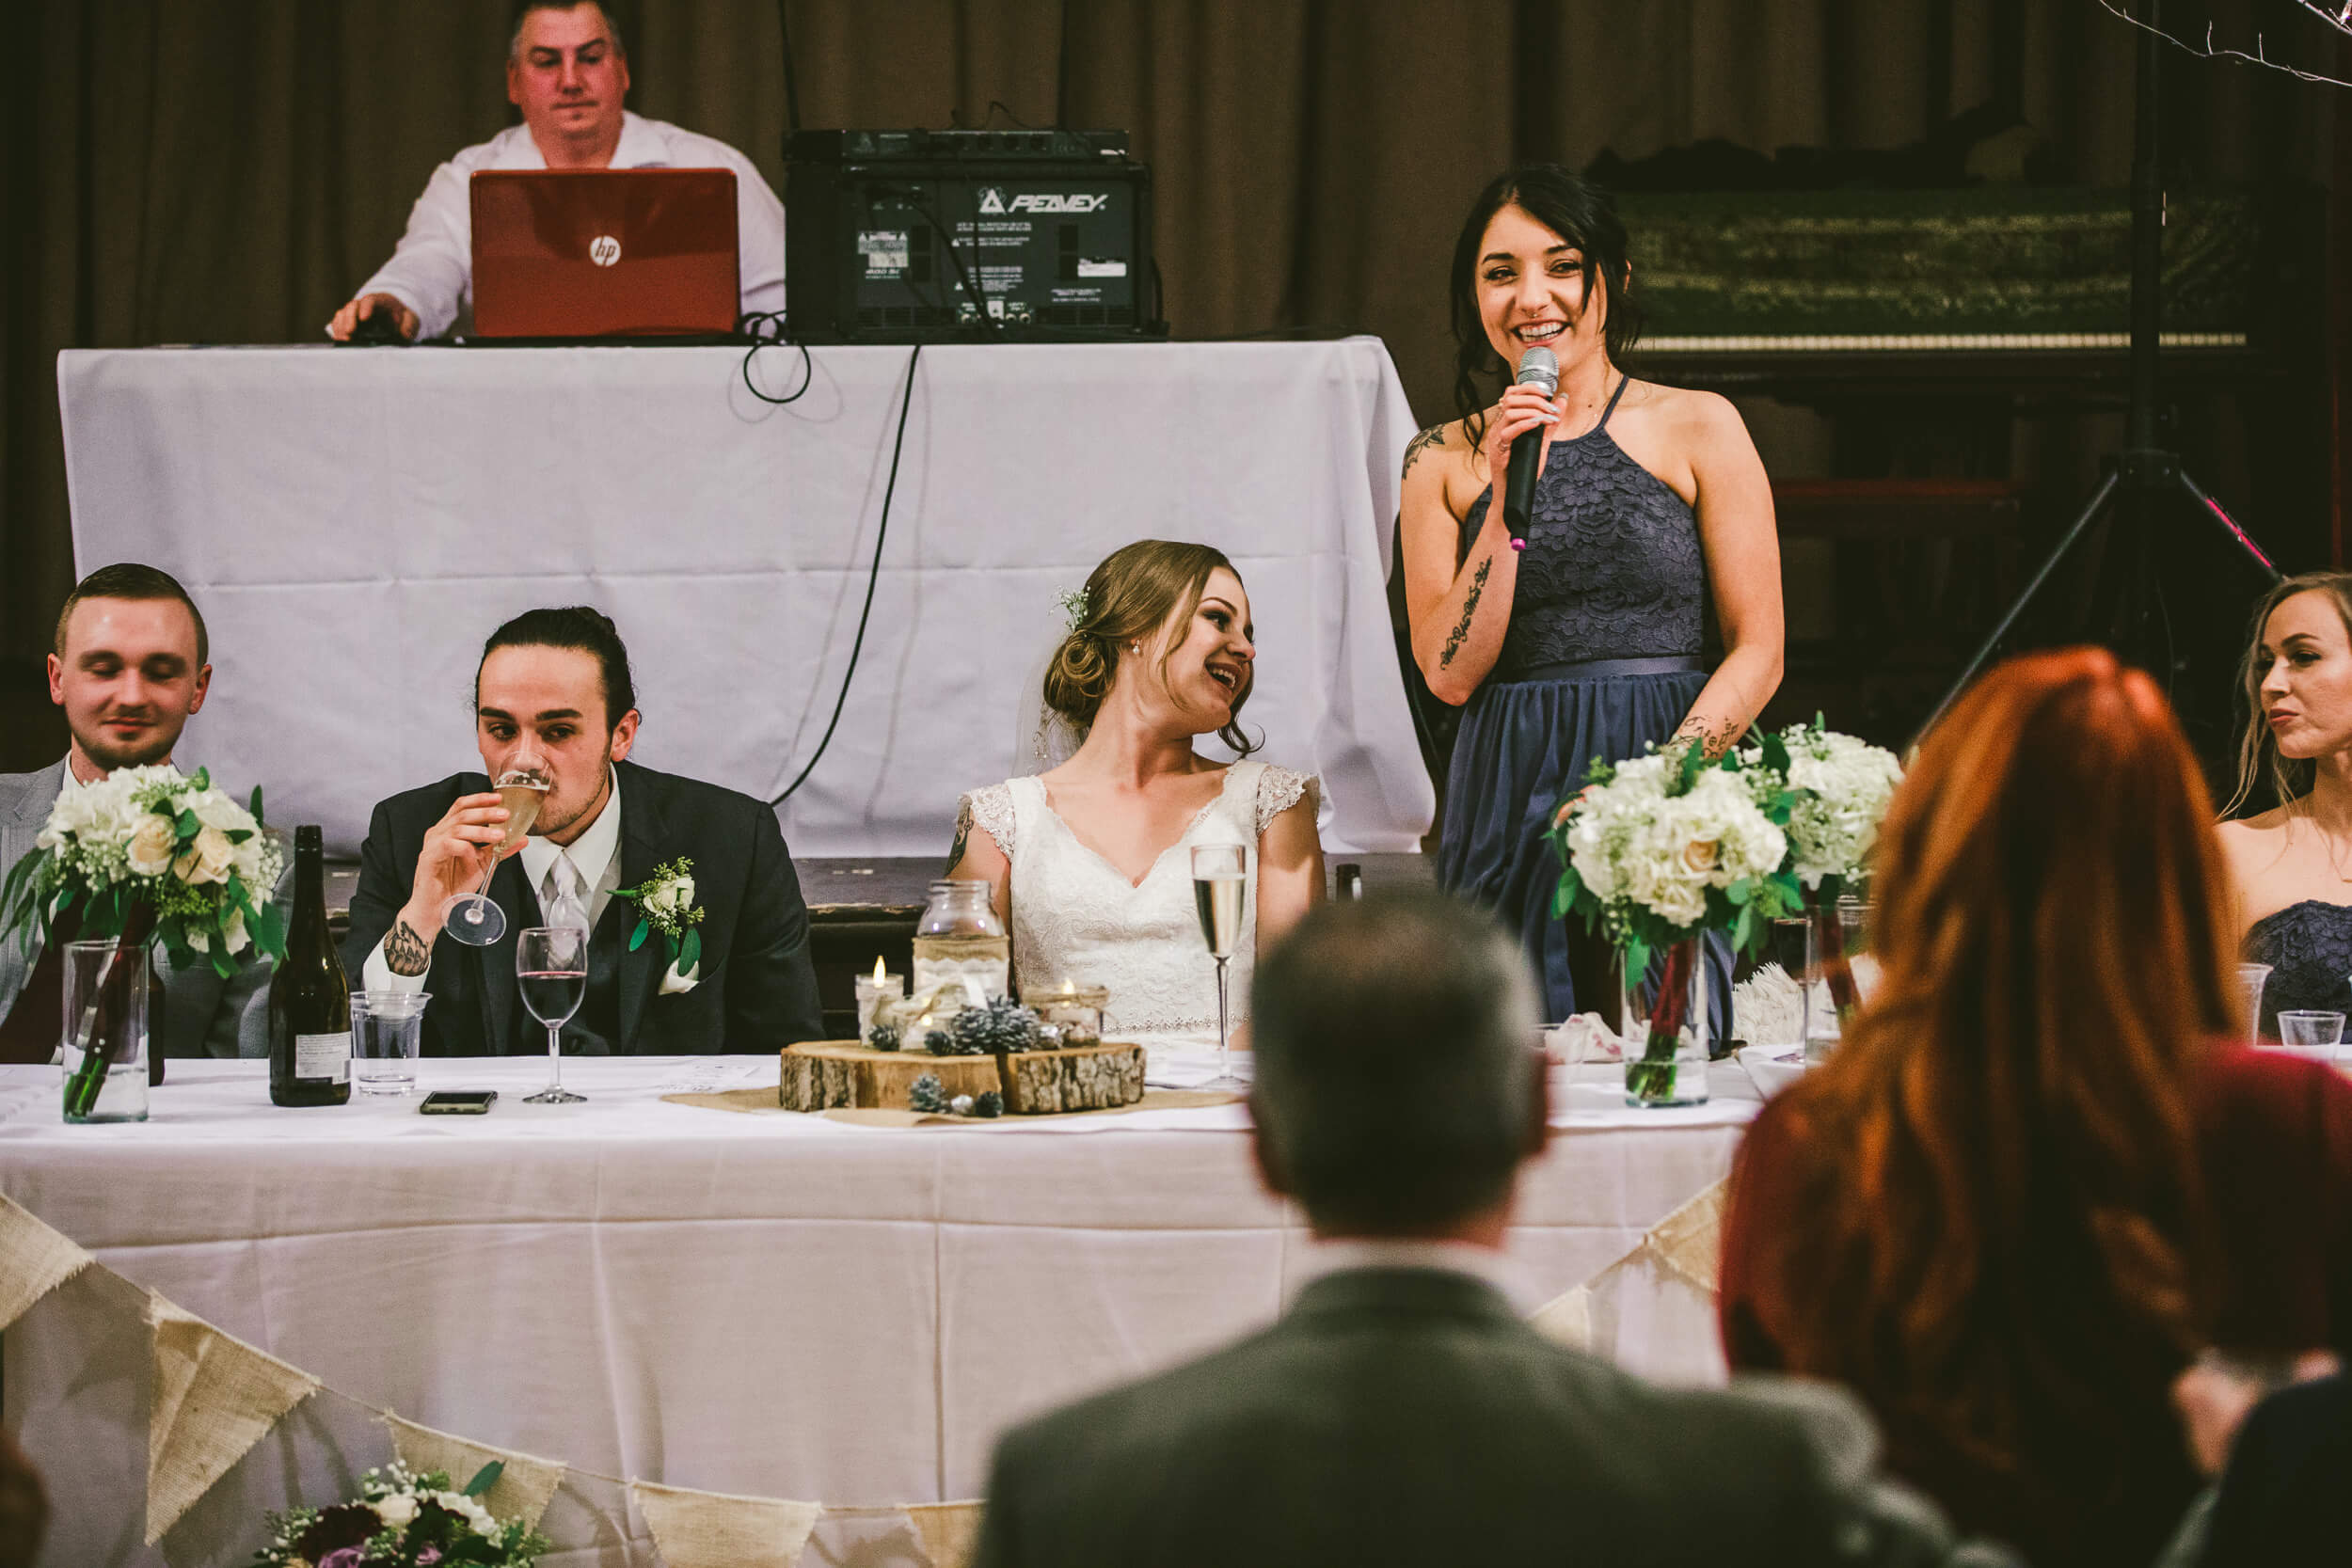 mukogawa winter wedding in spokane (240).jpg